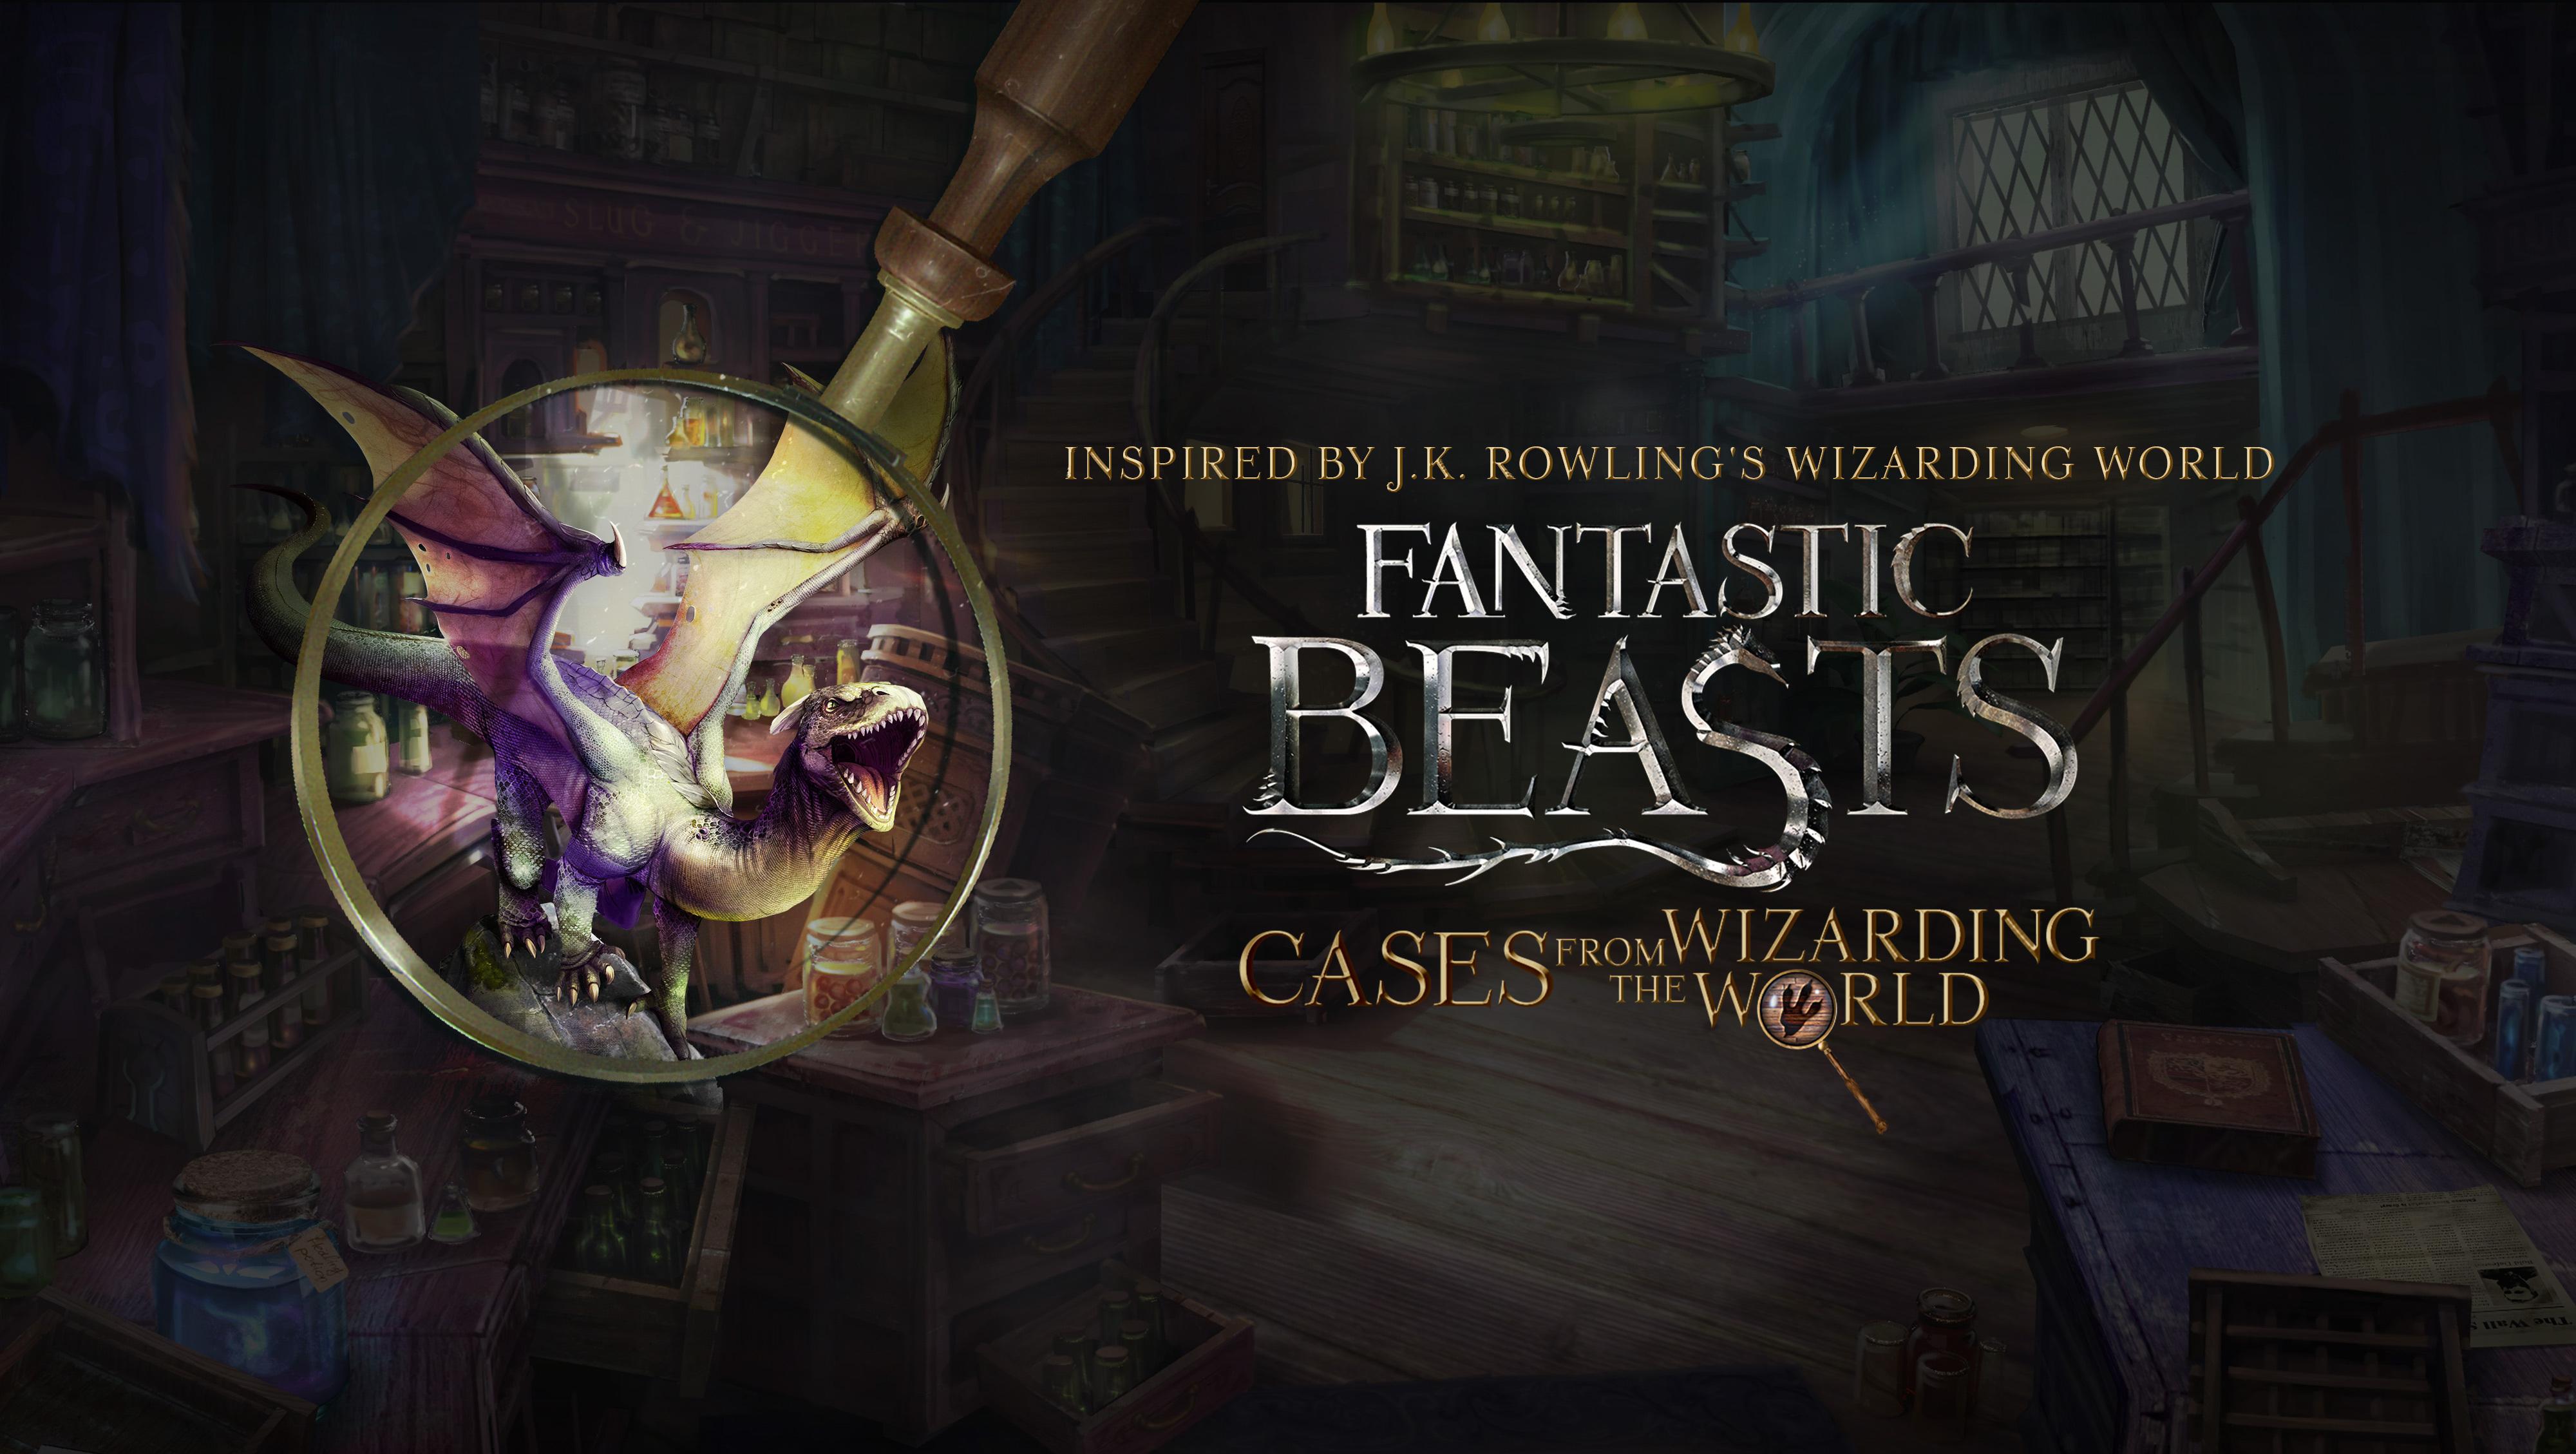 Fantastic Beasts: Cases Oyunu App Store'da ÜCRETSİZ